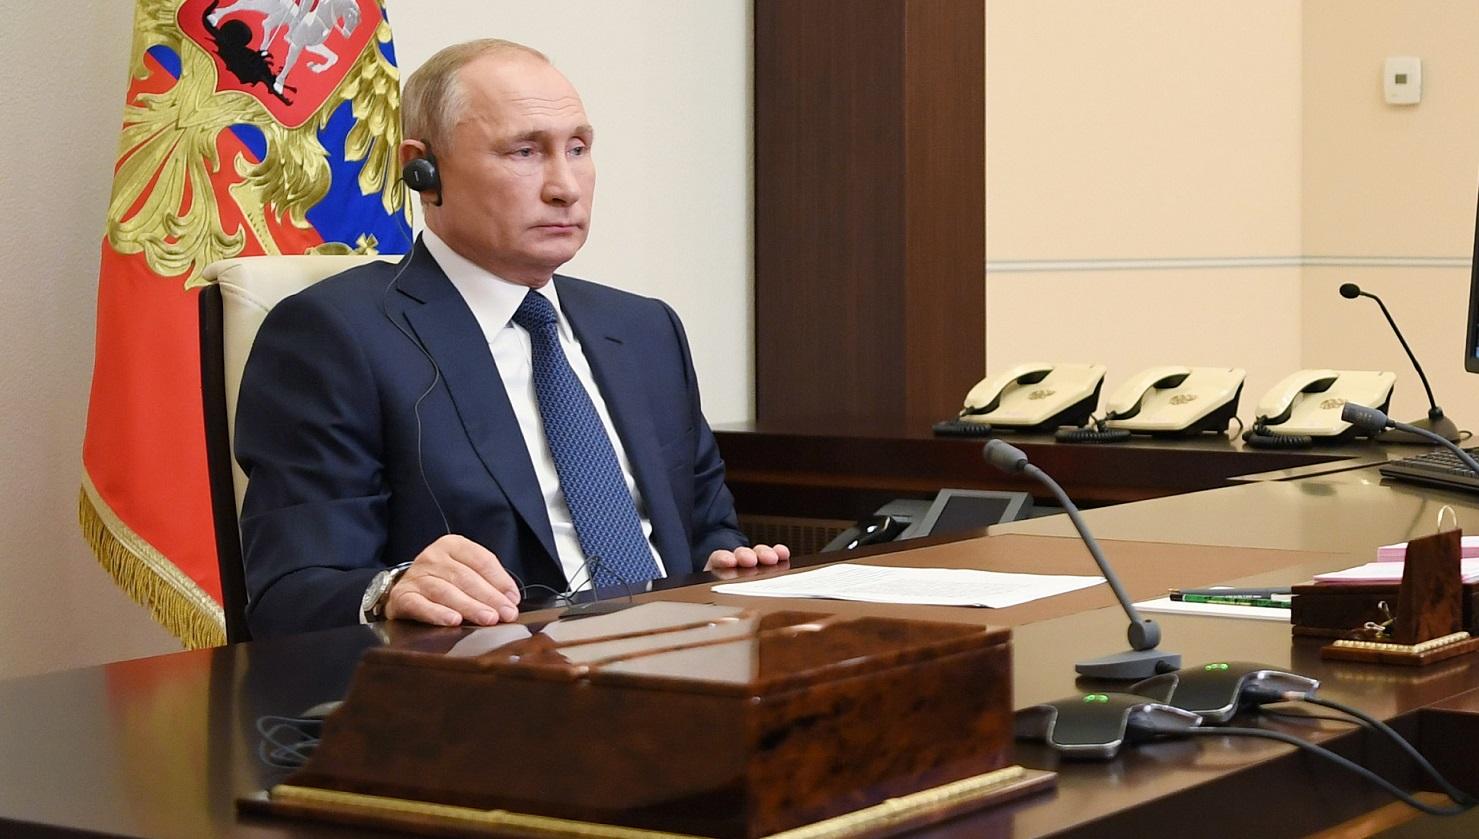 (Foto: Alexey NIKOLSKY / SPUTNIK / AFP)